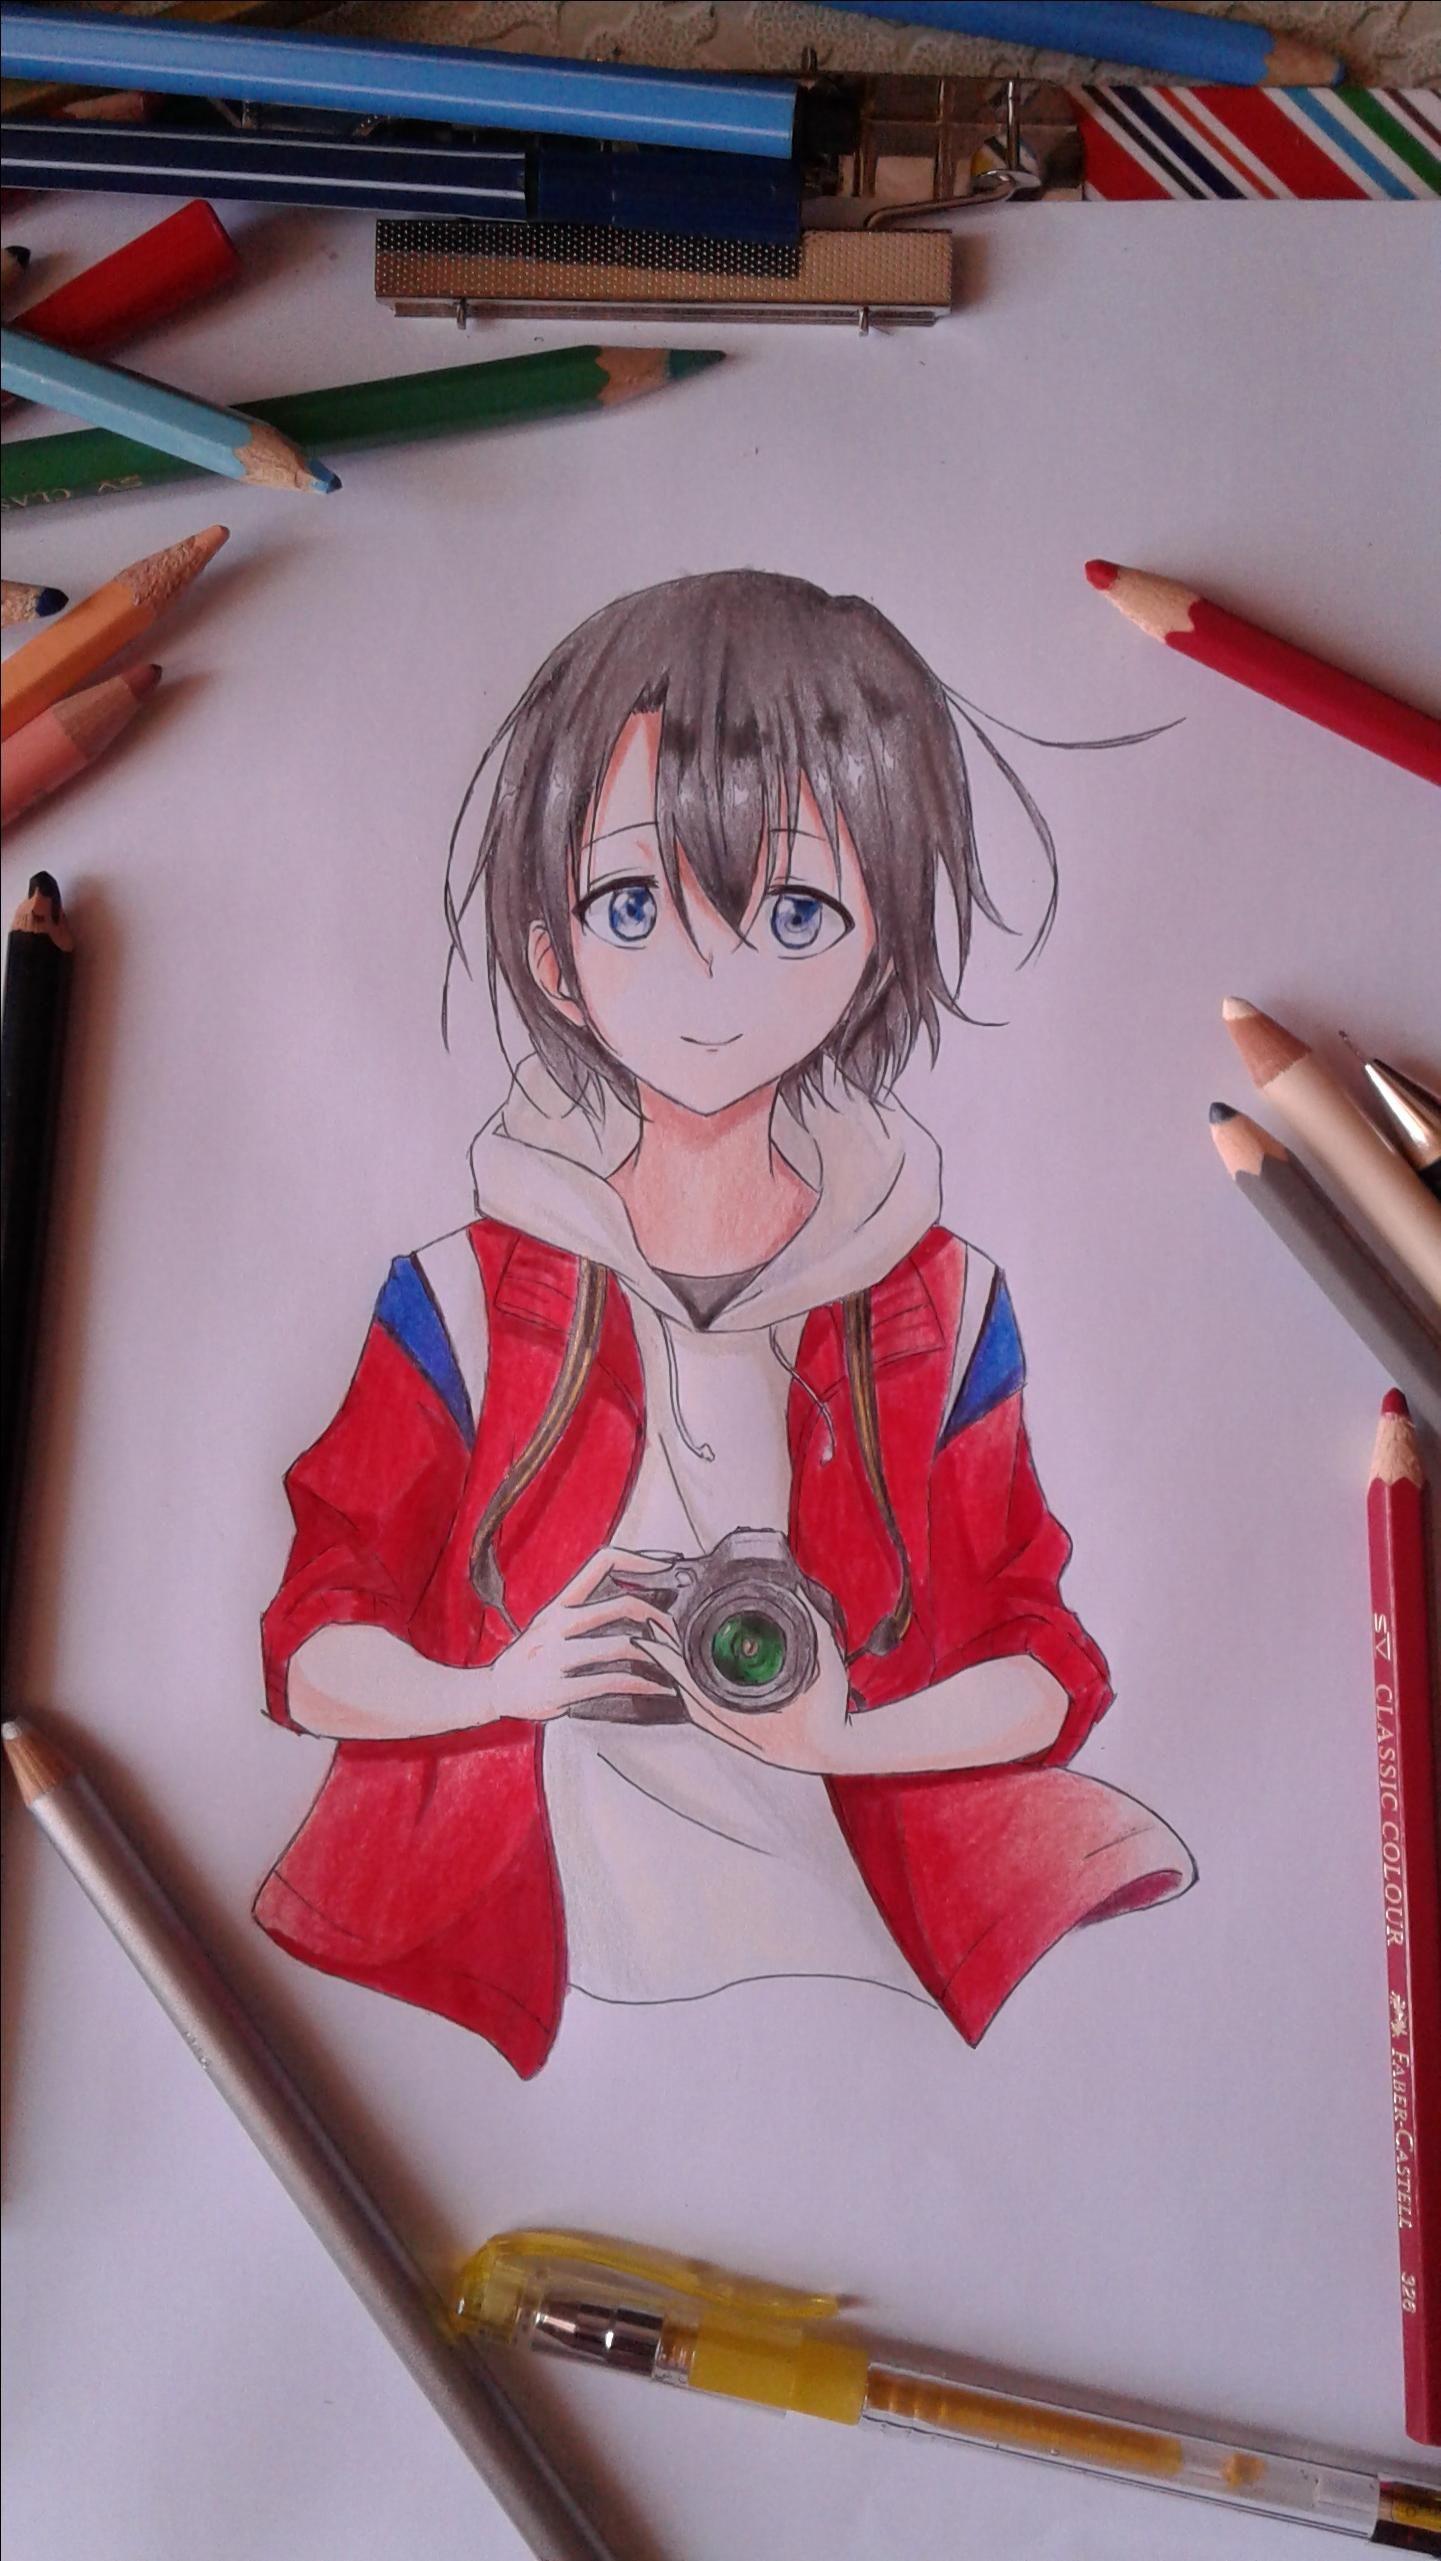 Pin By Natalia Alfonso On Anime Pict Anime Artwork Anime Sketch Anime Art Fantasy